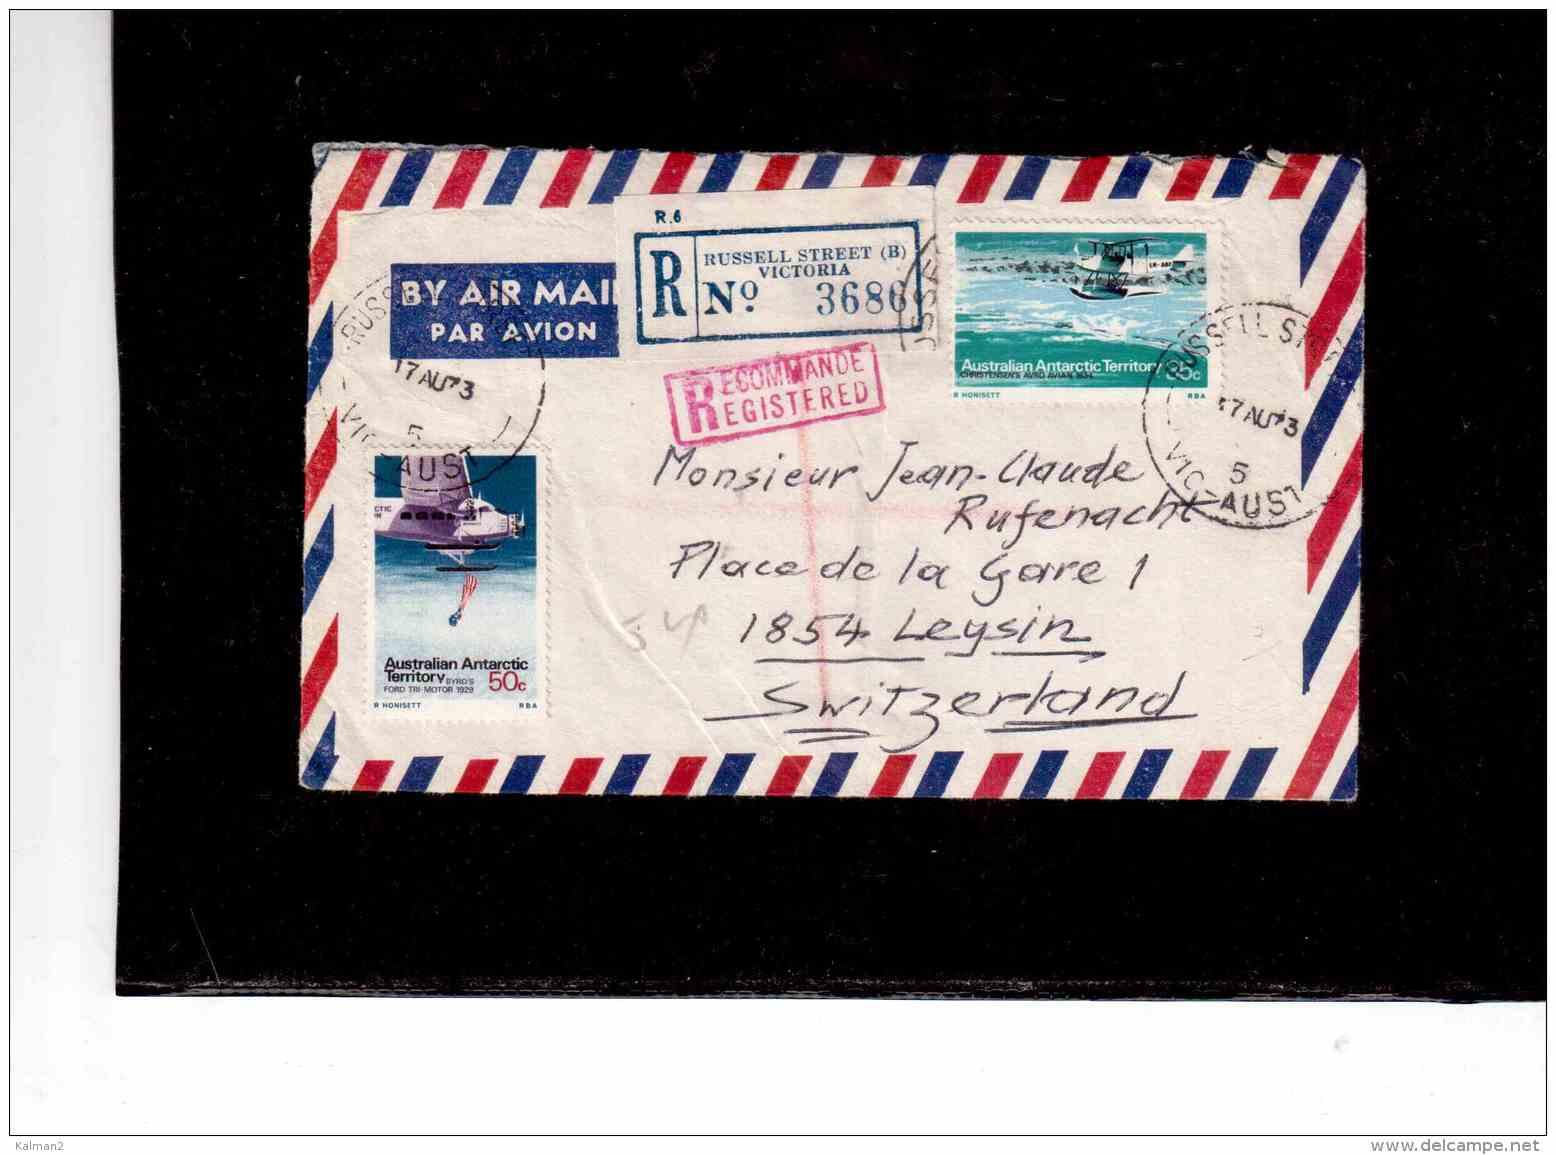 TEM8936     -   AUSTRALIAN ANTARTIC TERRITORY  POSTAL HISTORY     /     REGISTERED AIR MAIL LETTER TO SWITZERLAND5 - Storia Postale